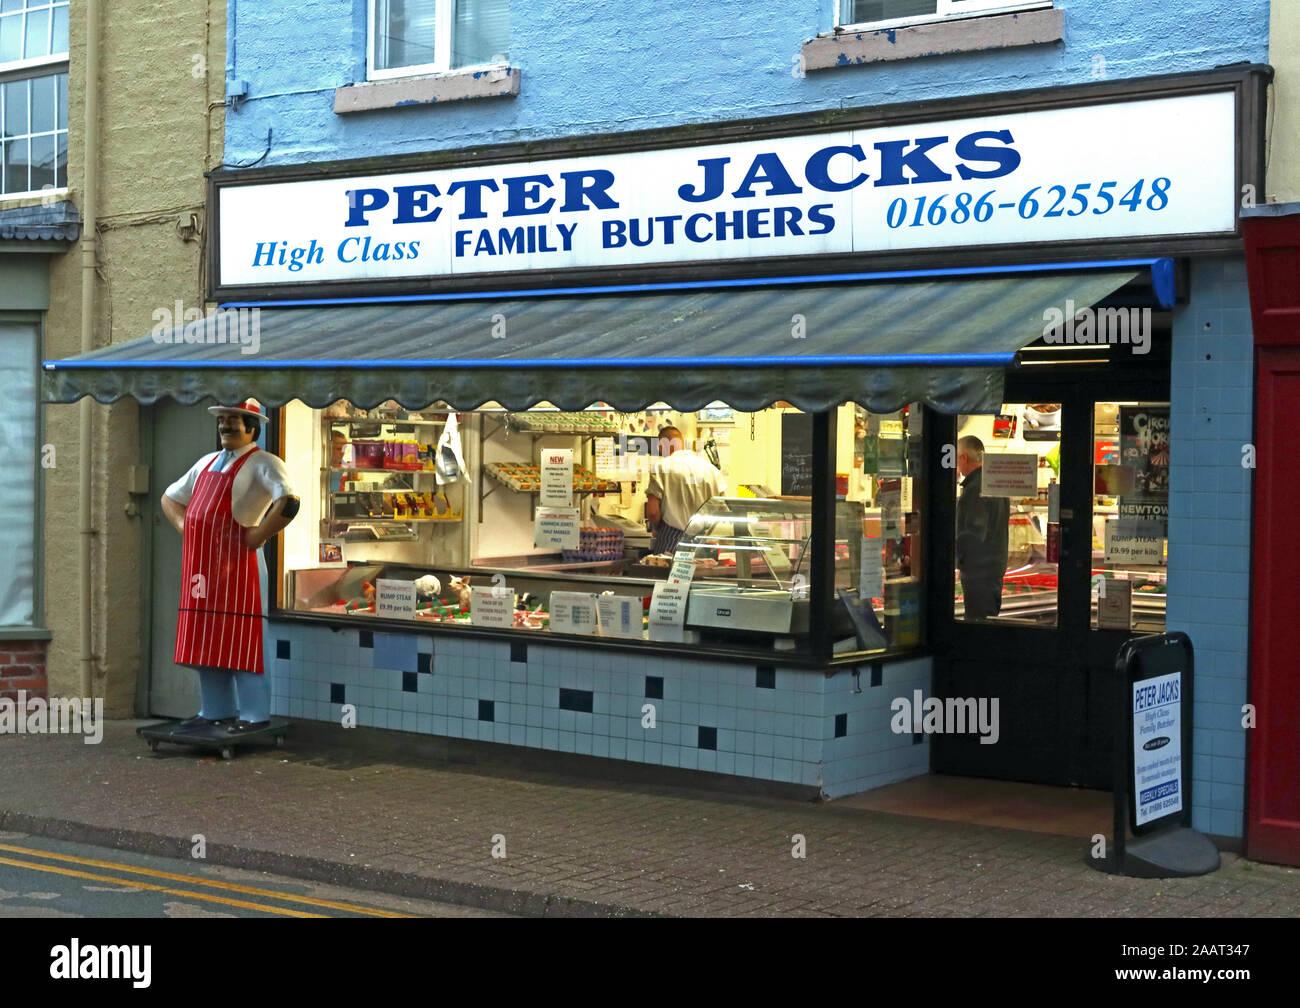 HotpixUk,@HotpixUK,GoTonySmith,UK,England,English,Wales,01686-625548,Market St,High Class